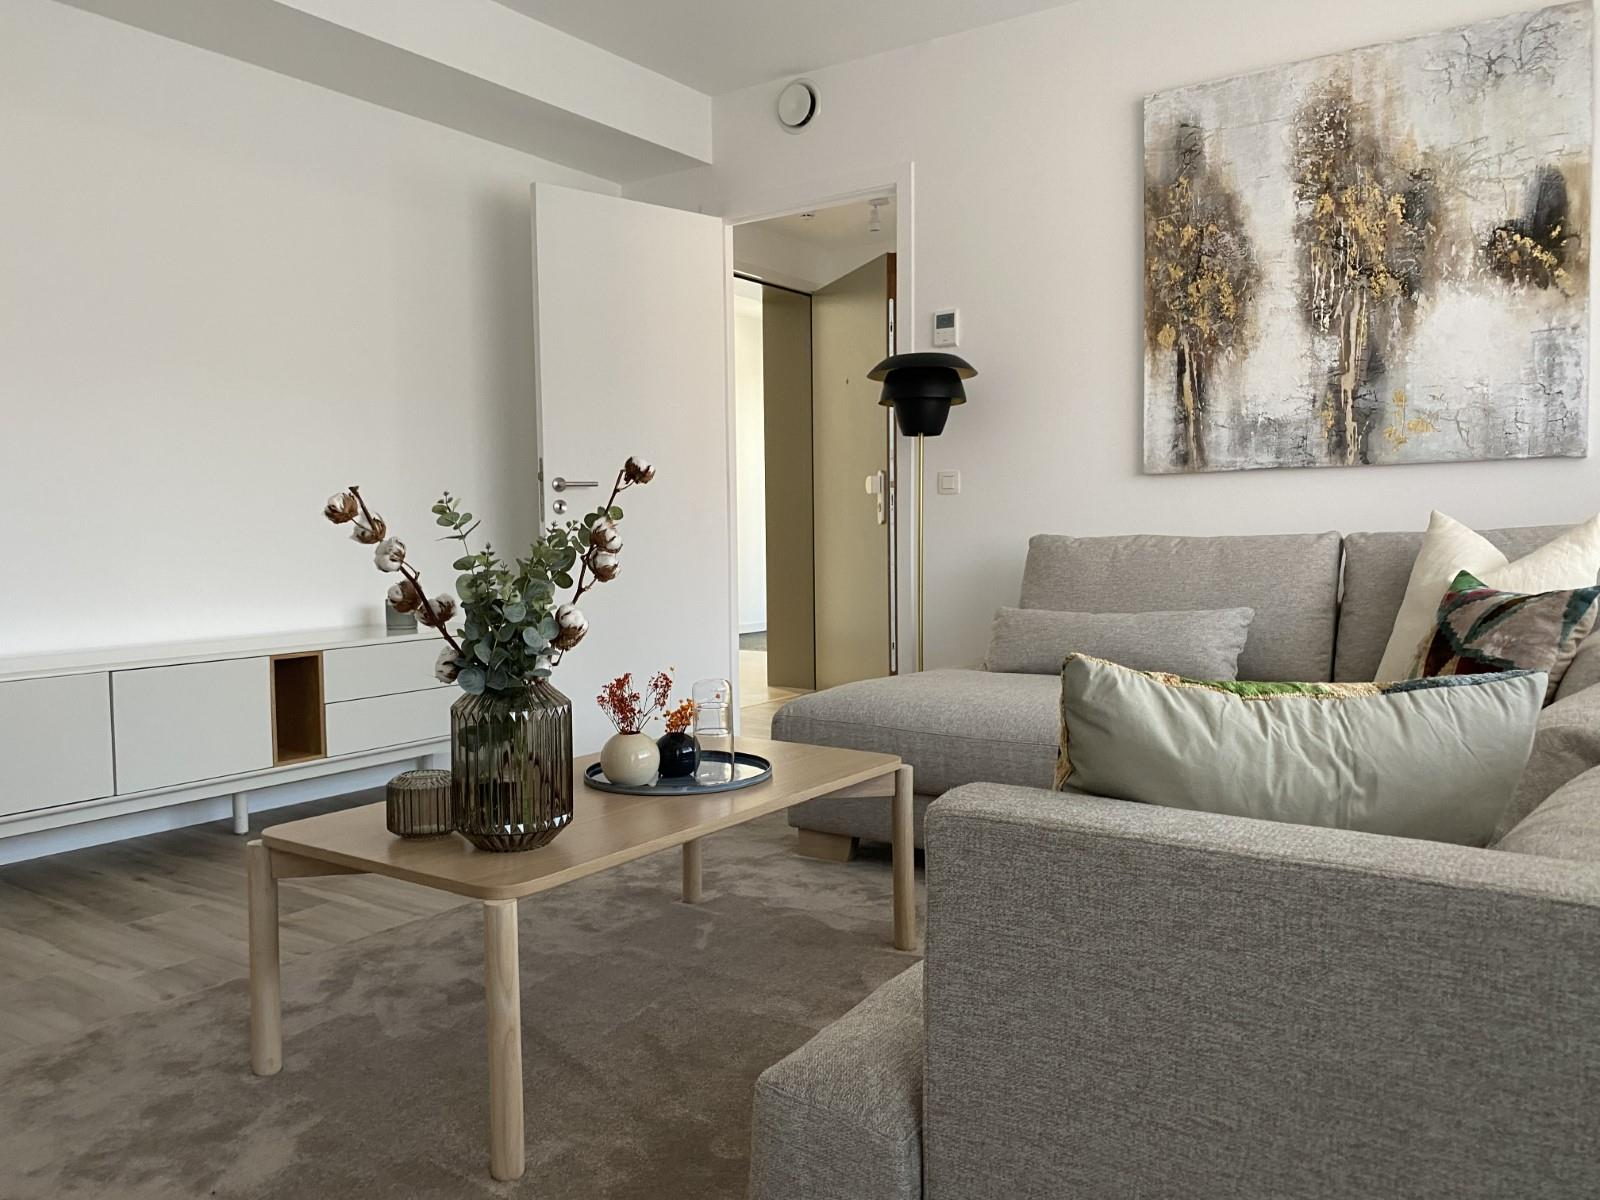 Appartement - Woluwe-Saint-Lambert - #4251247-1